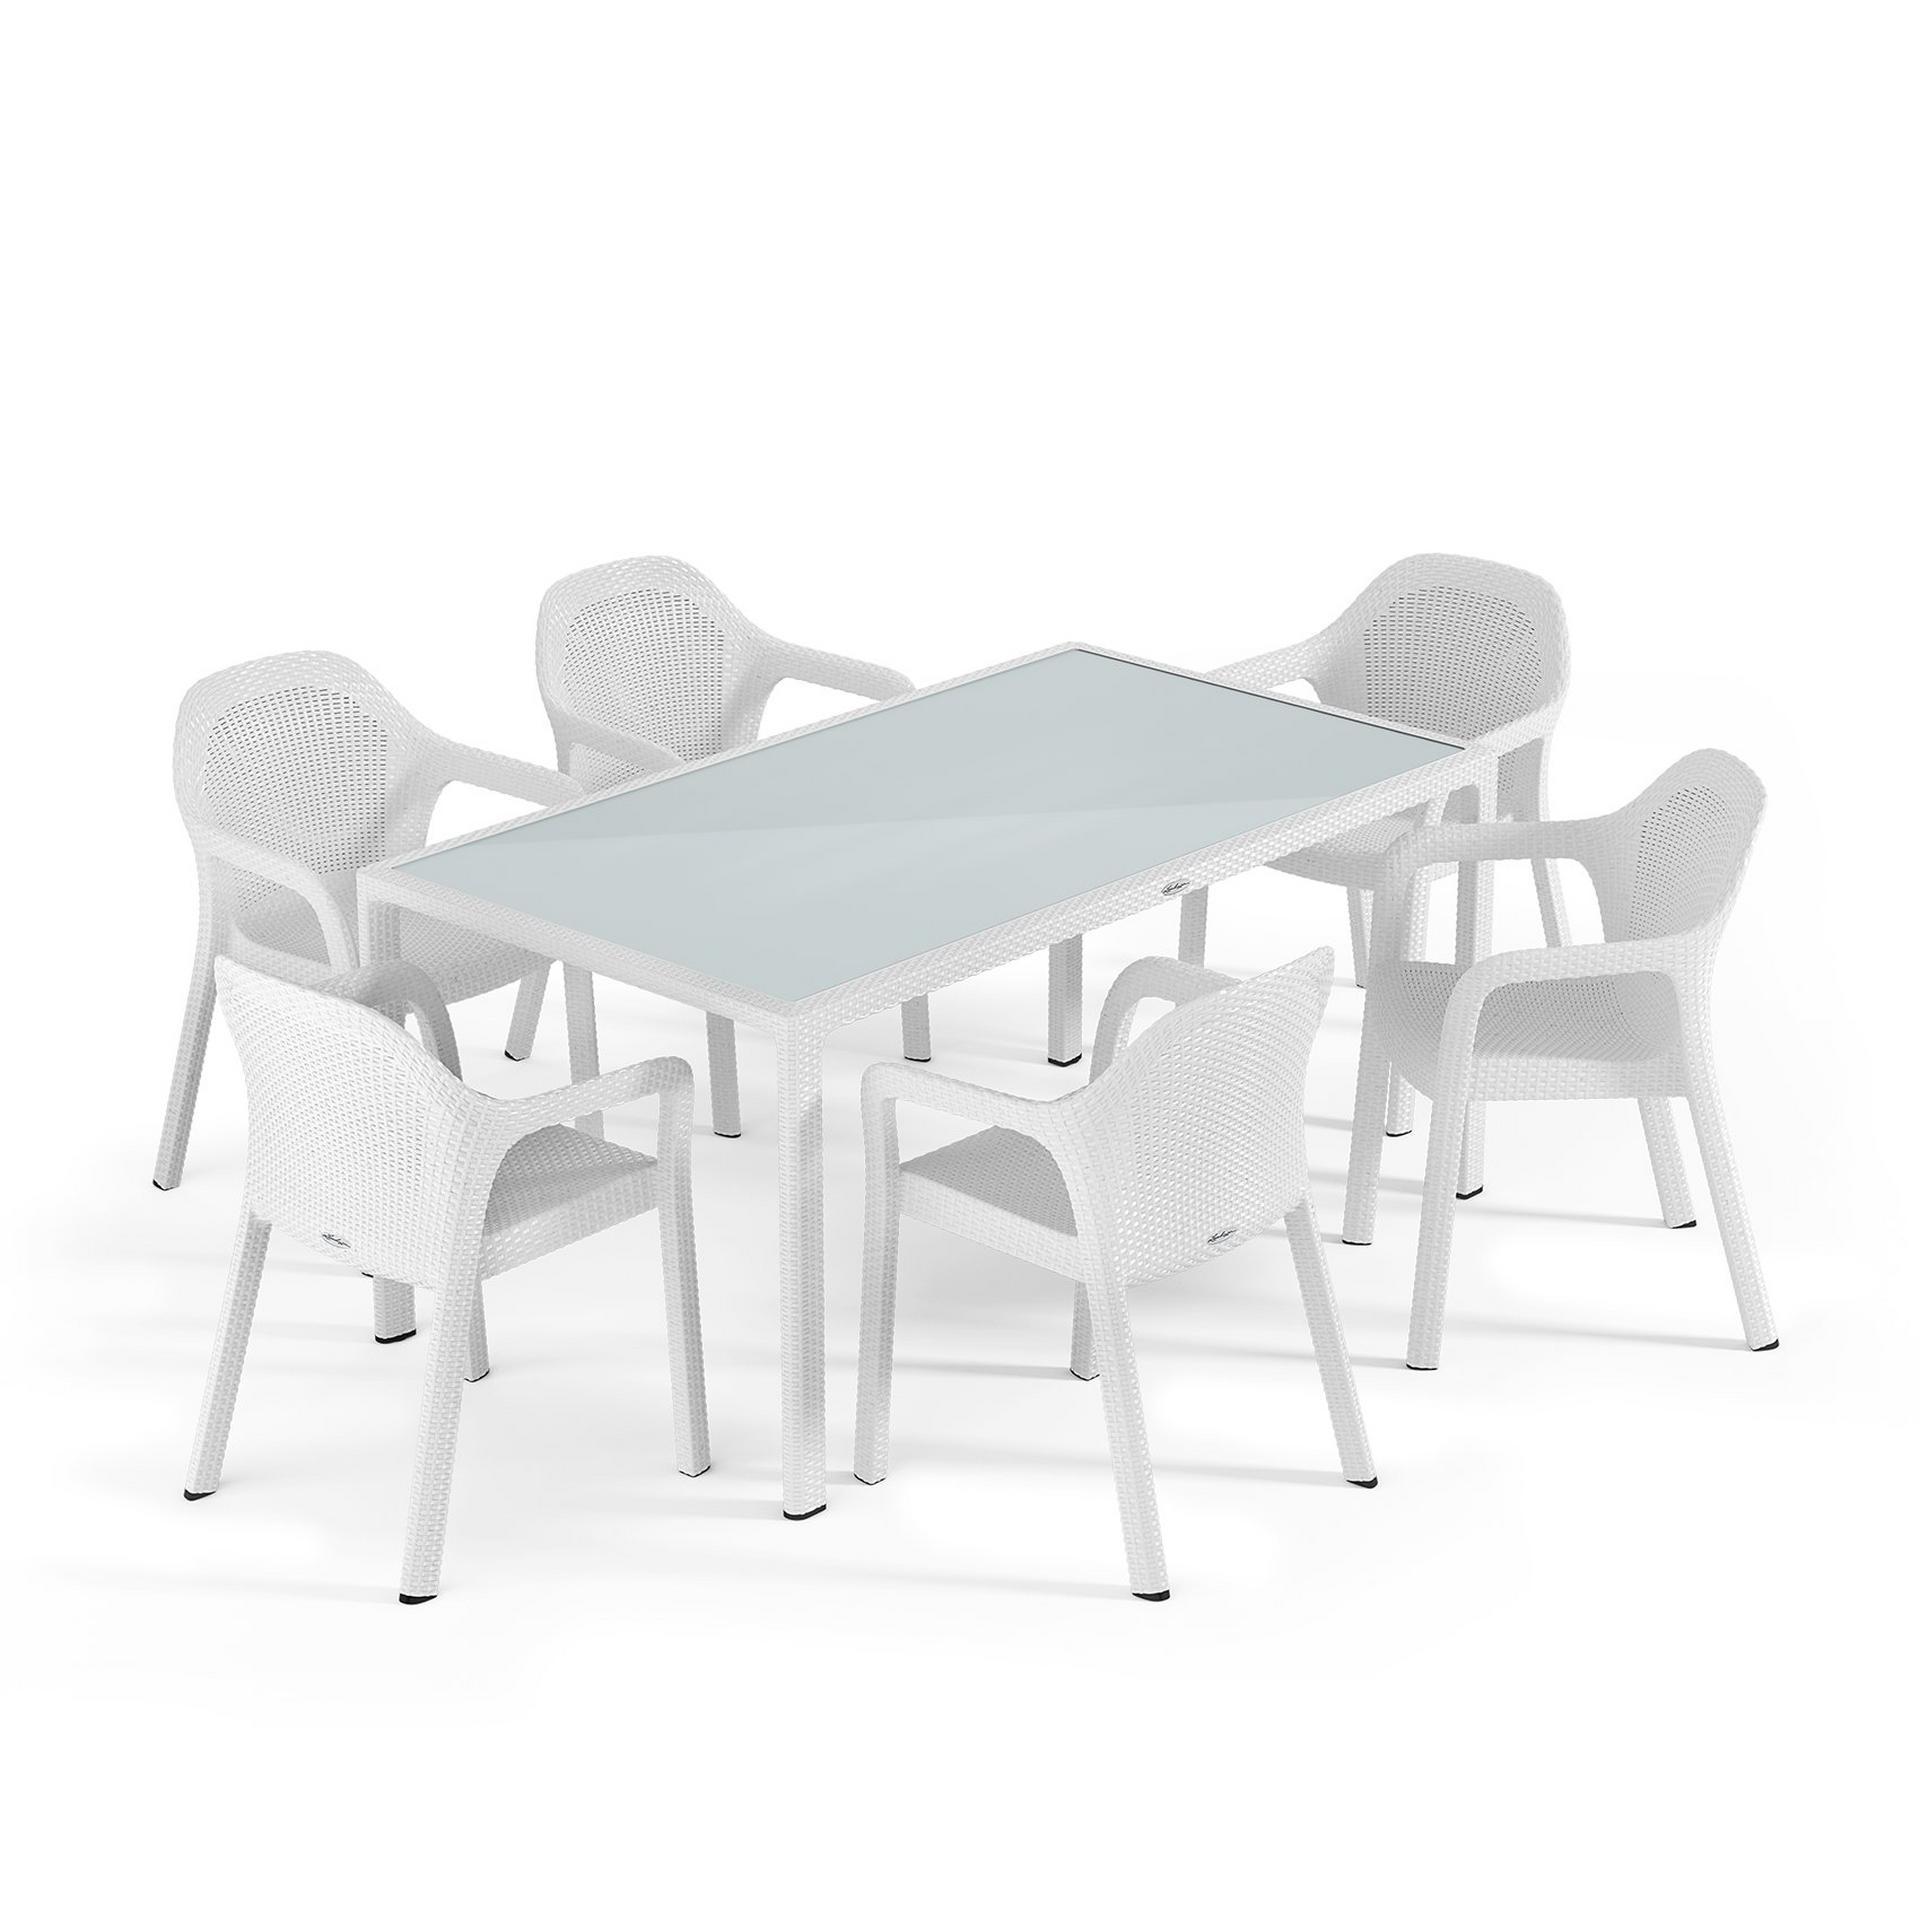 Combination Set of 7 white